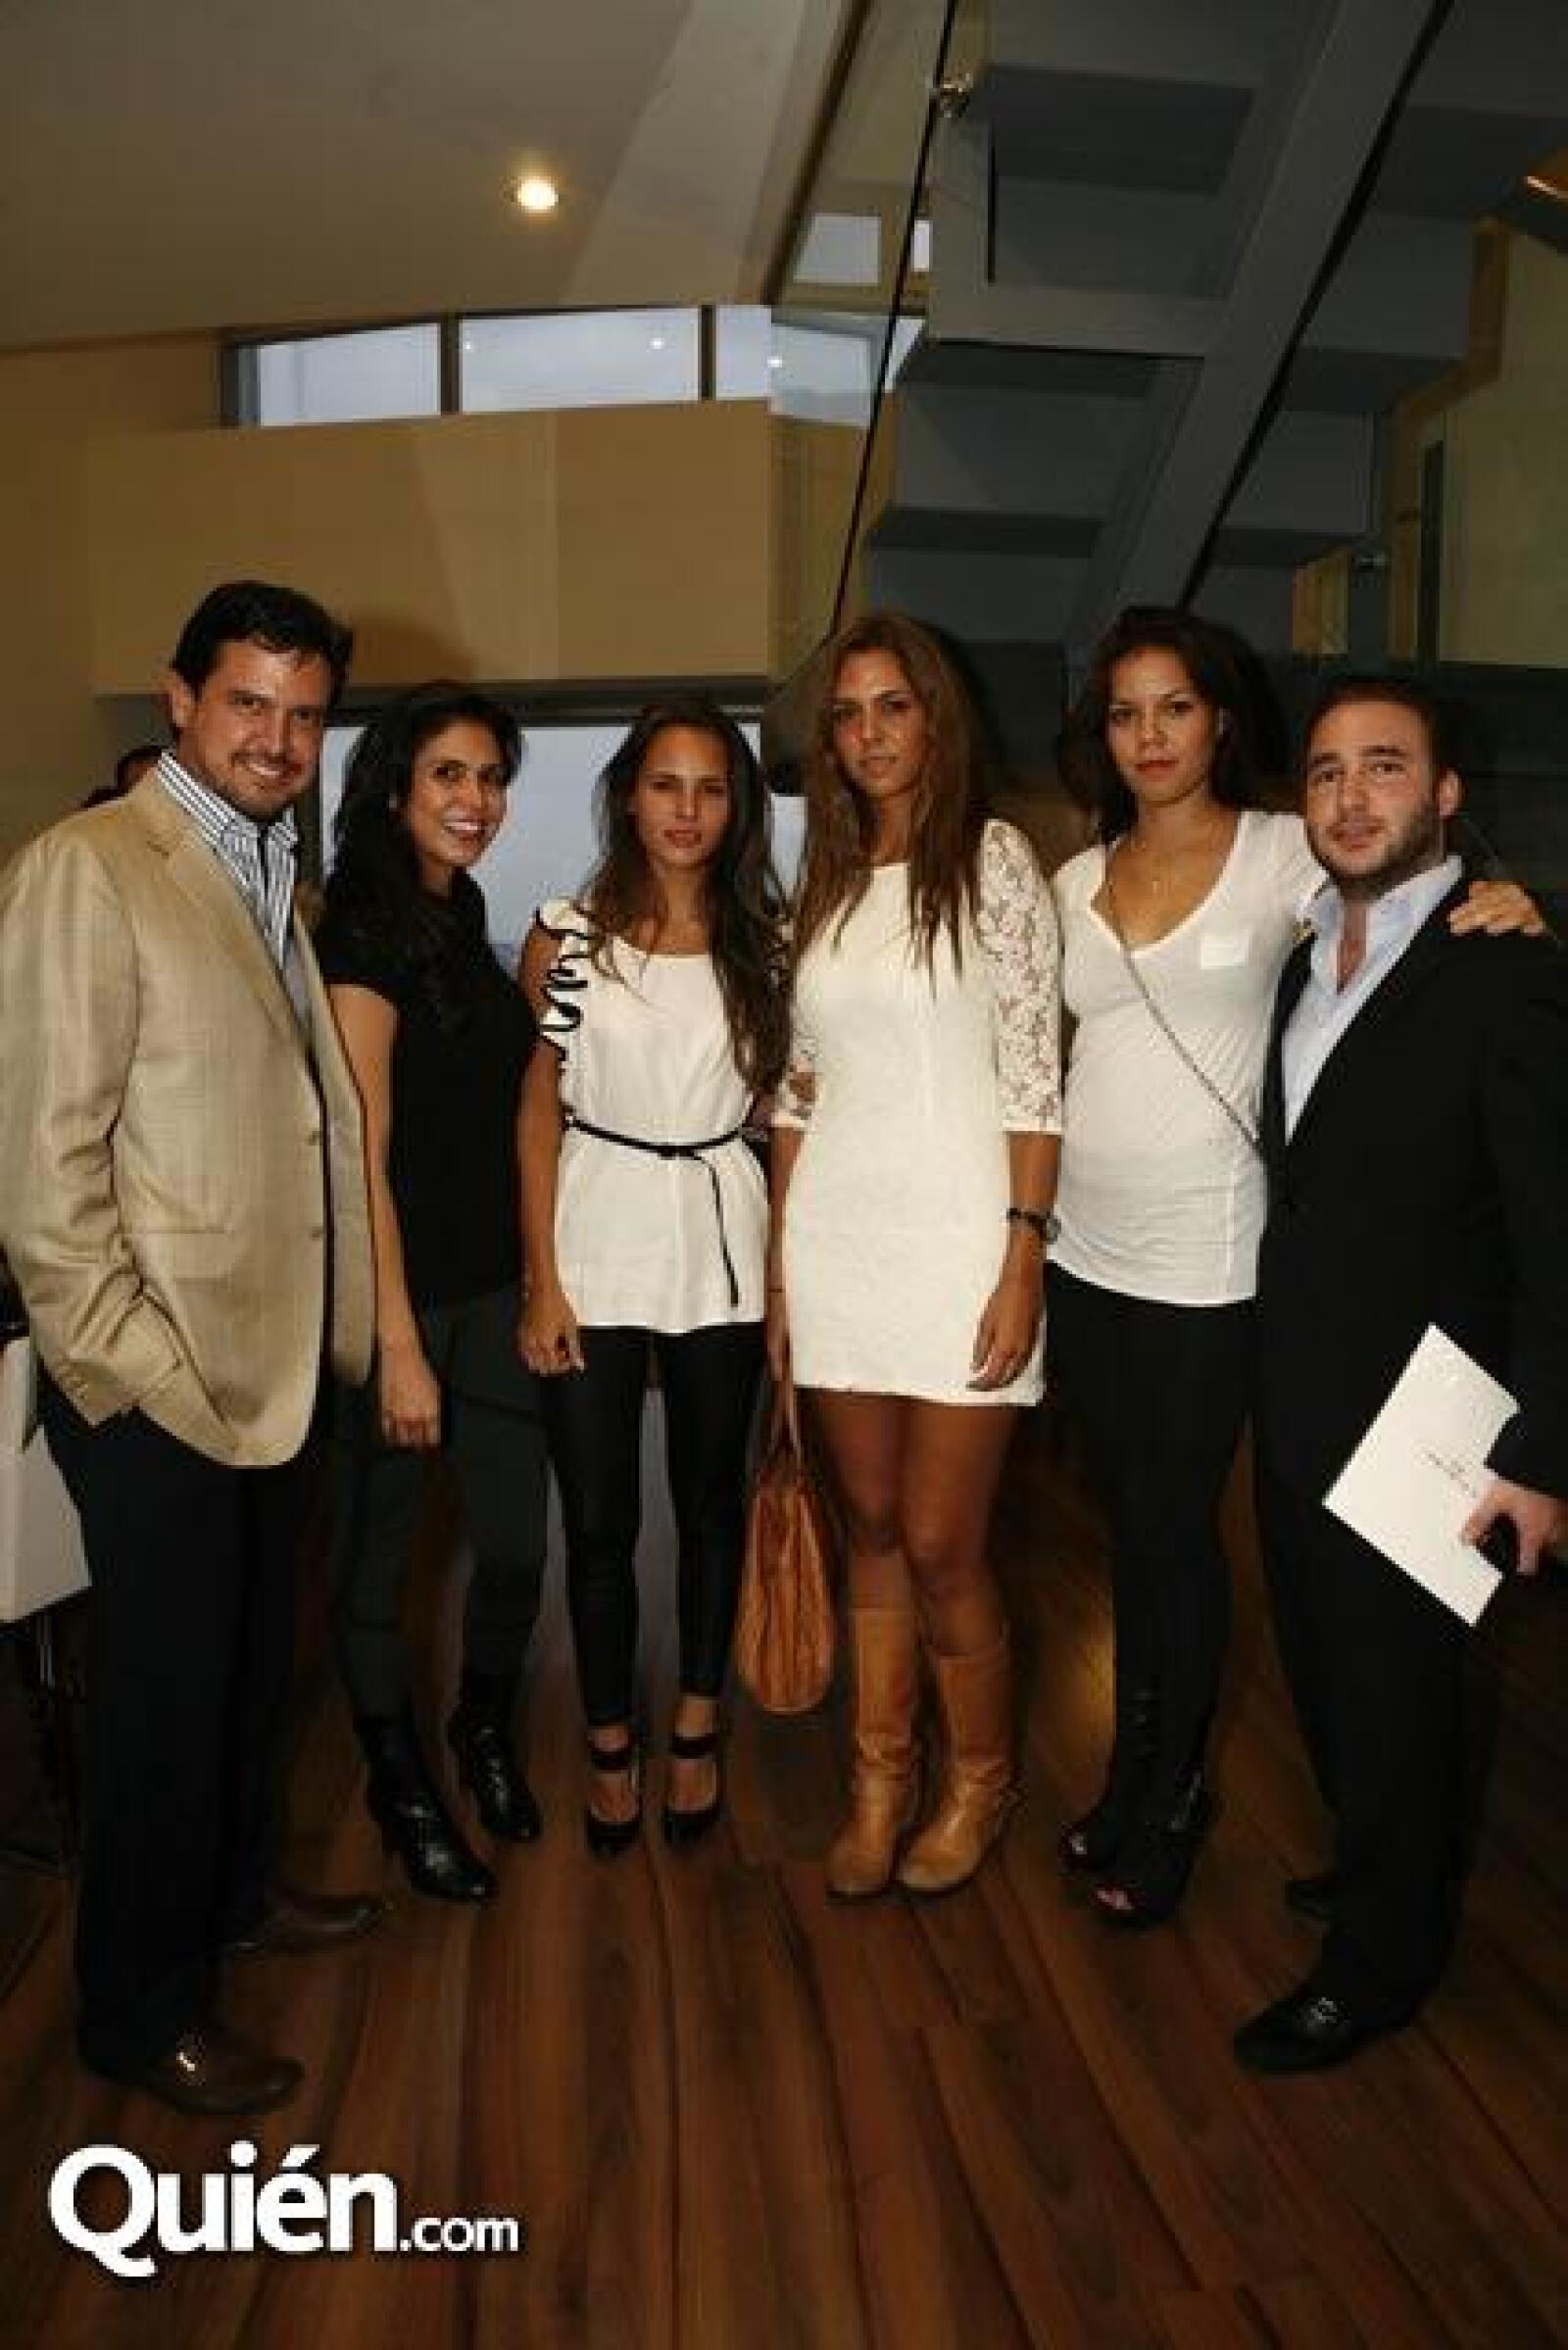 Archi Marván,Paola Casale,Bárbara Galindo,Greta Galindo,Adriana Sosa,Álvaro Zavala